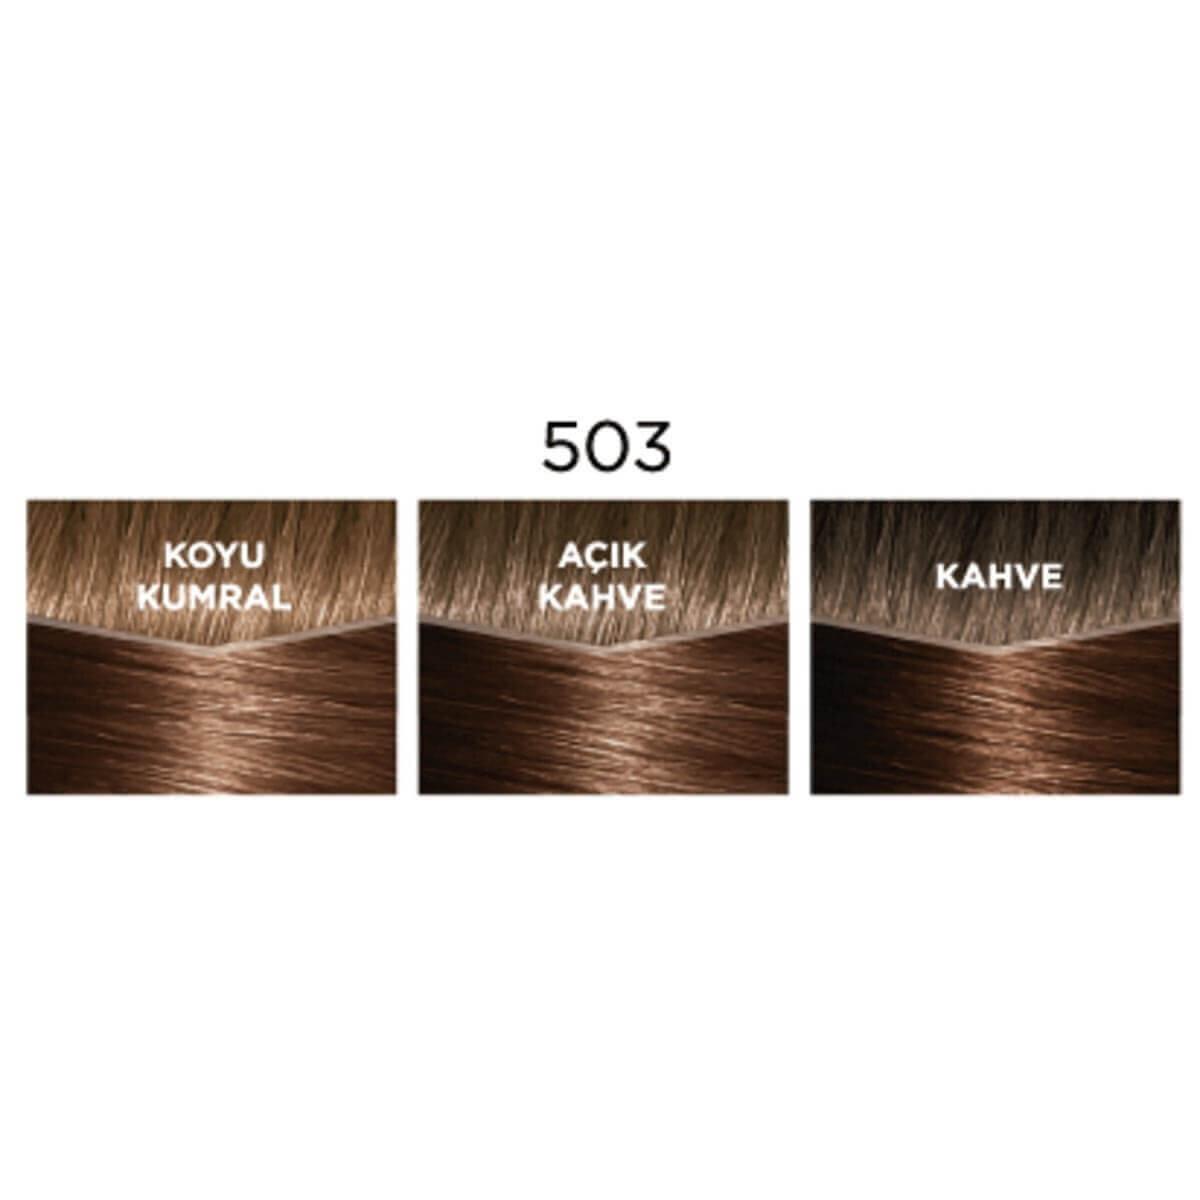 Creme Gloss Saç Boyası Altın Çikolata No. 503